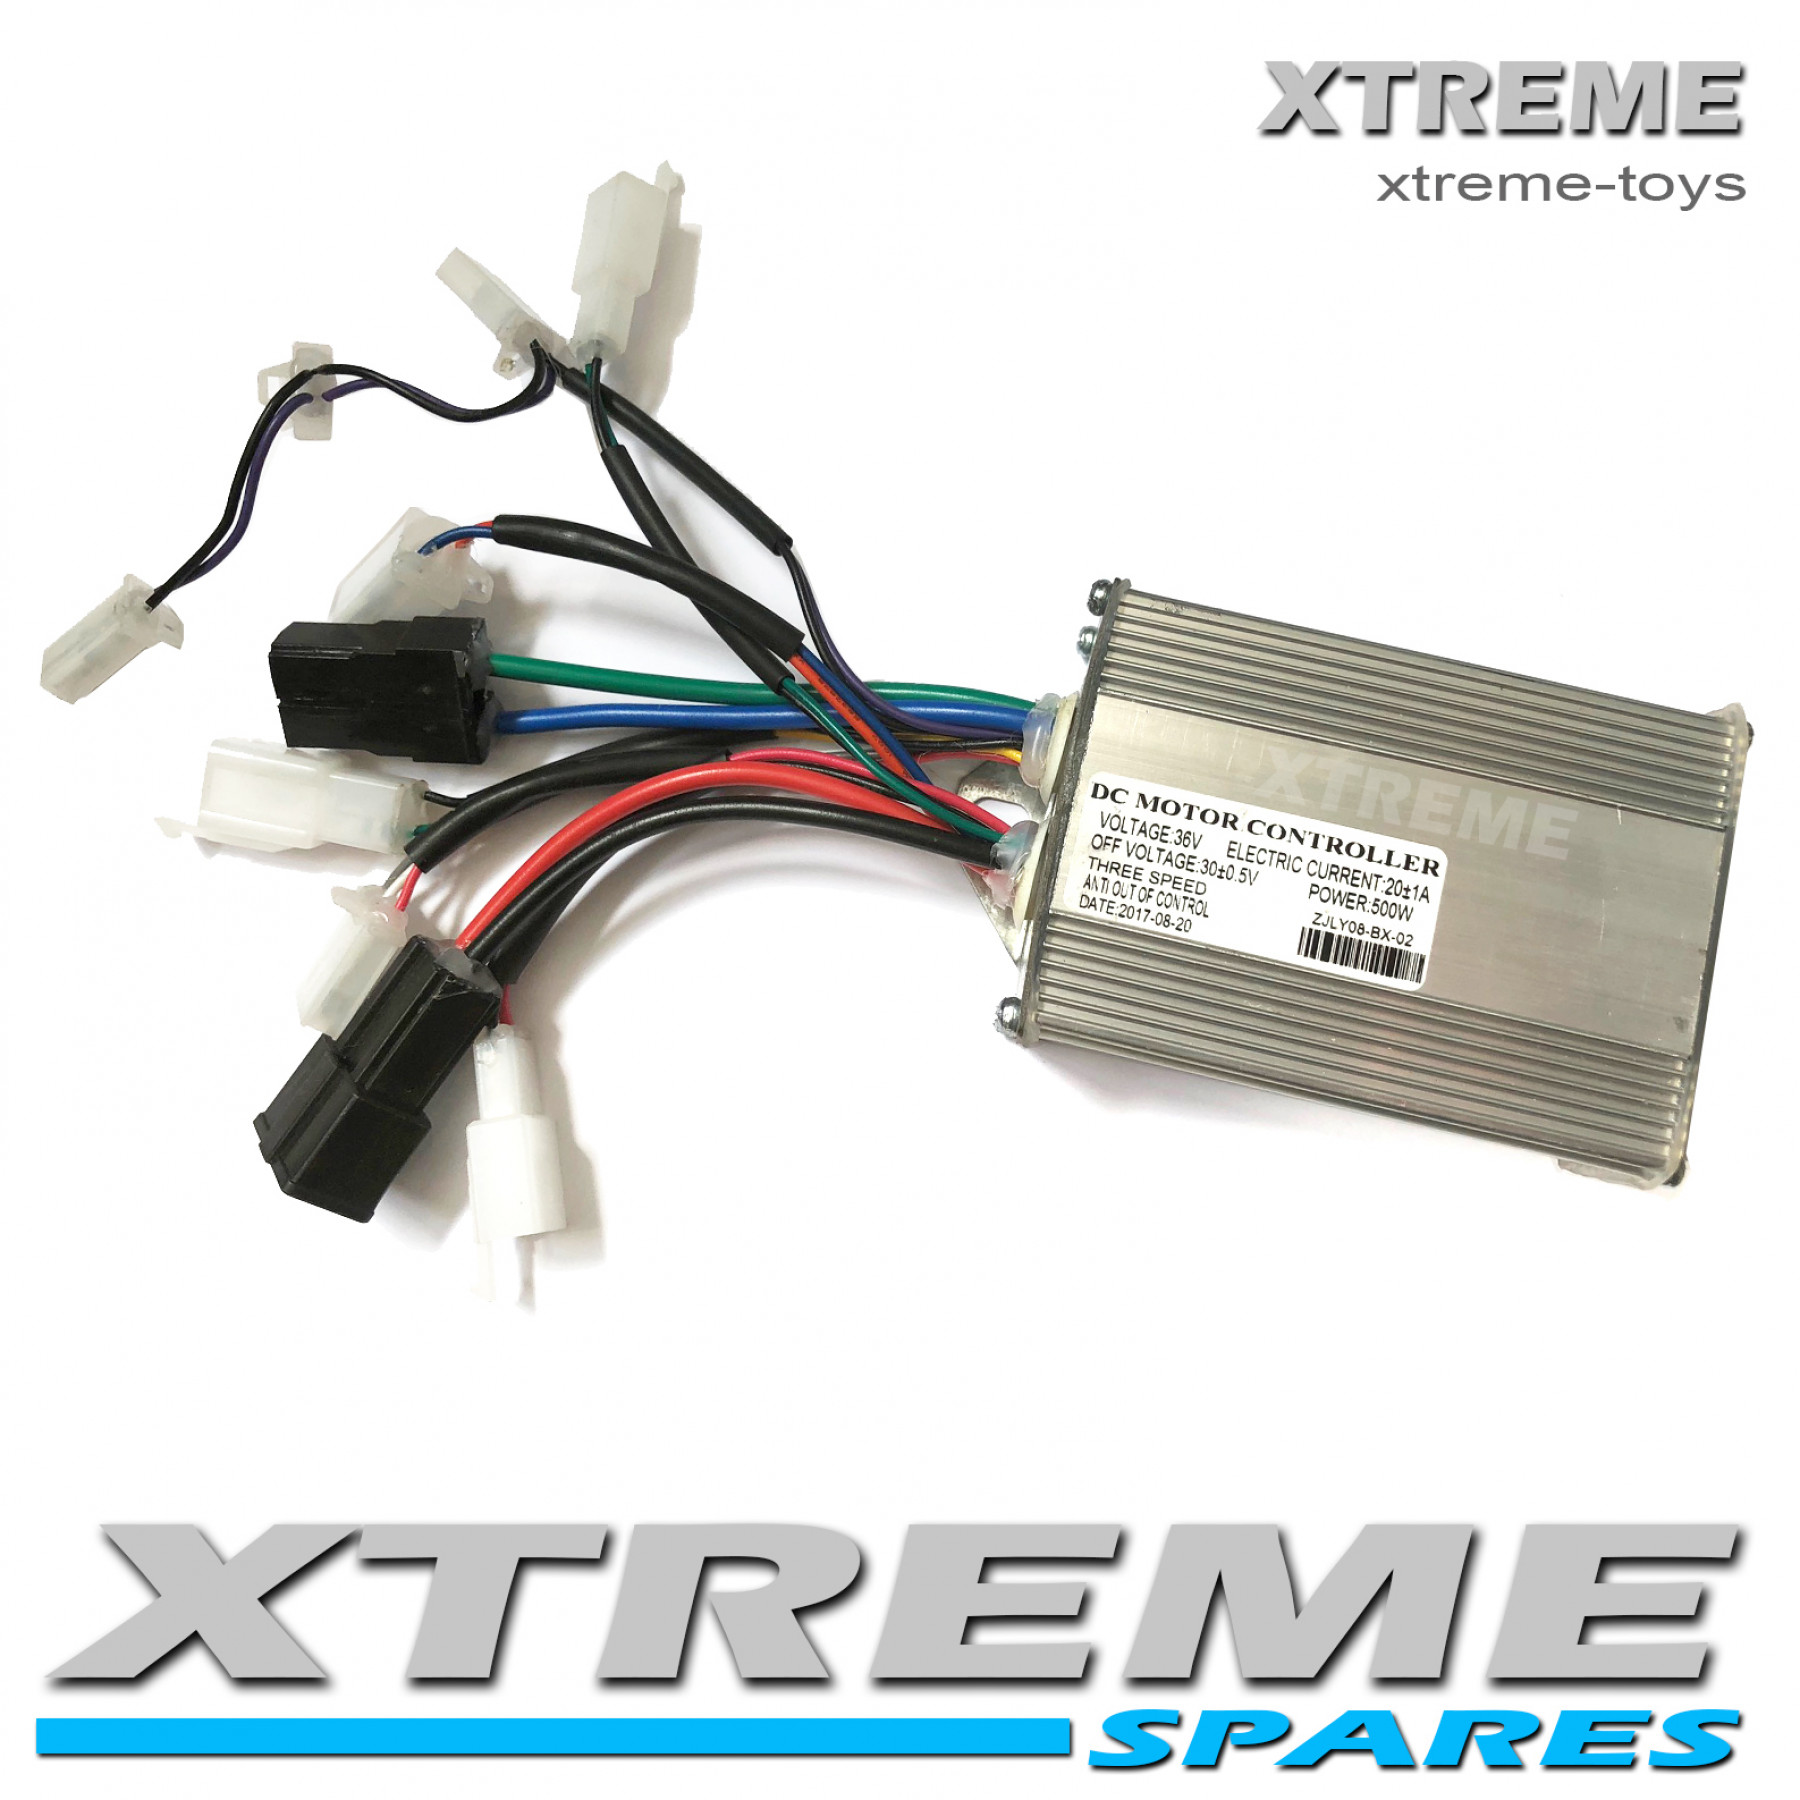 ELECTRIC XTM MINI DIRT BIKE SPEED 36v 500W CONTROLLER